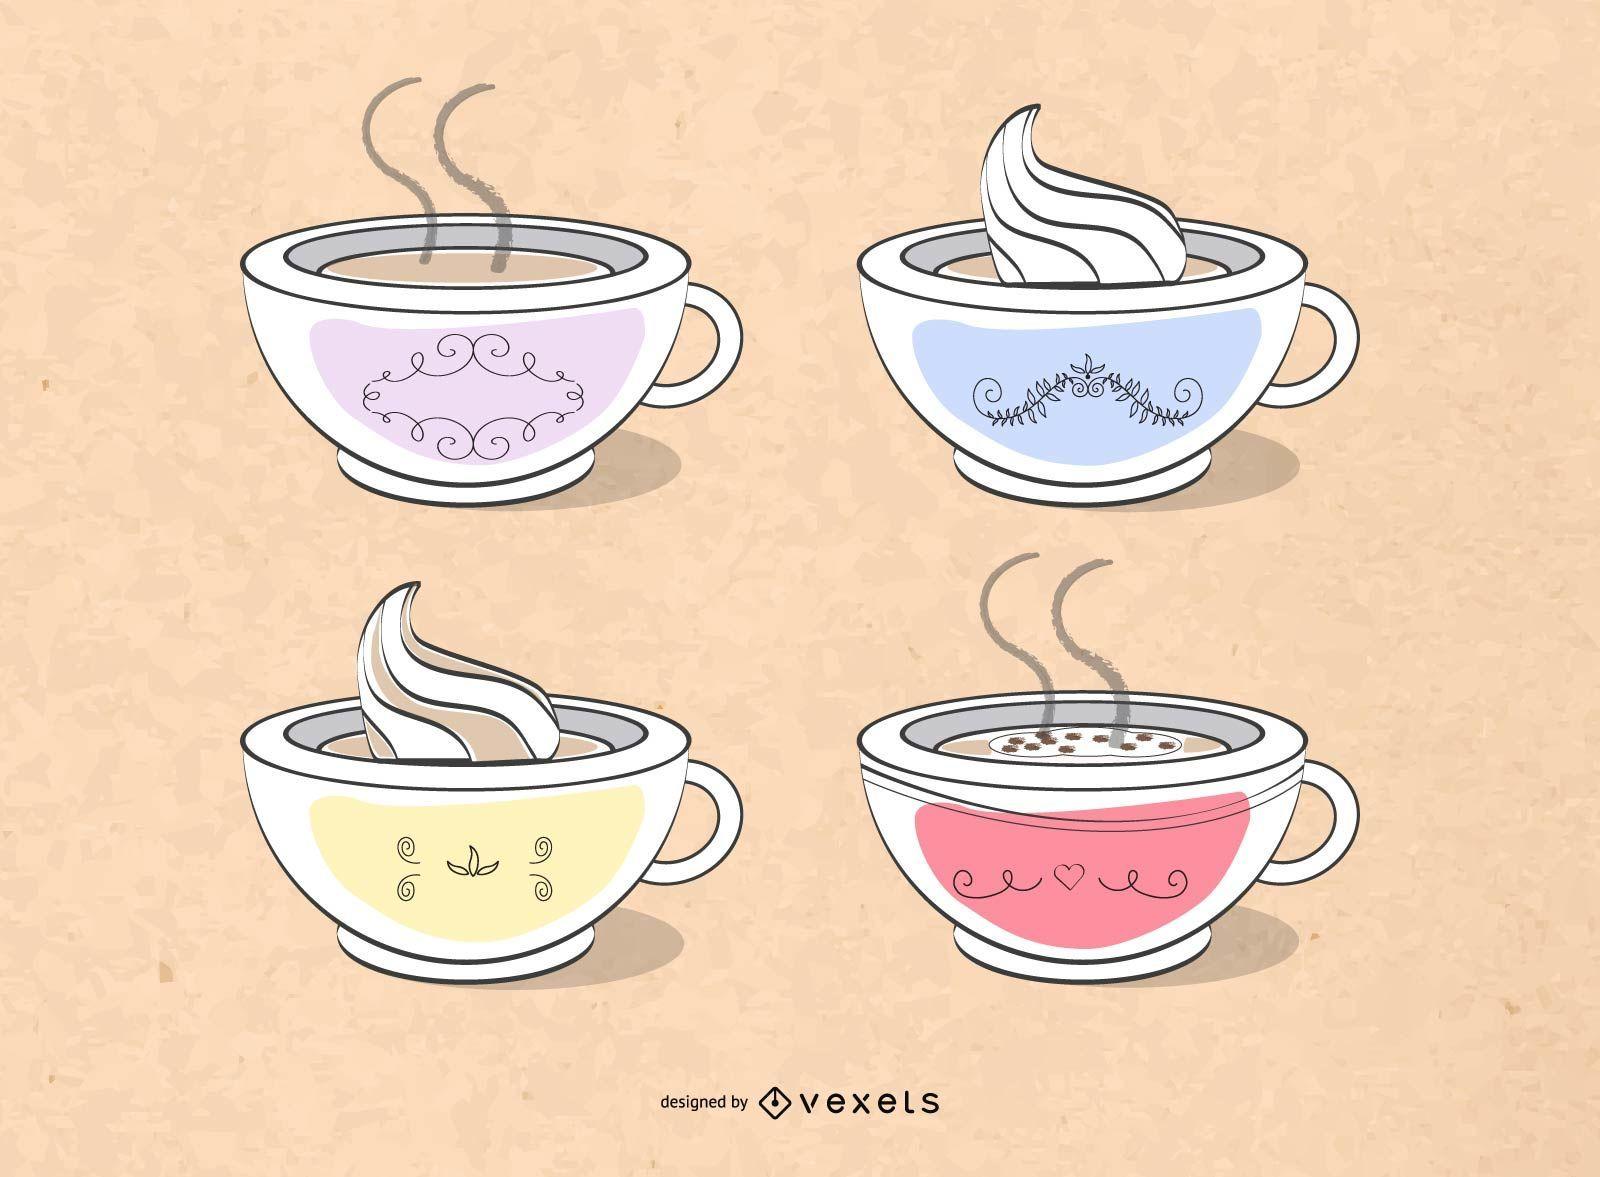 Dibujos de tazas de café